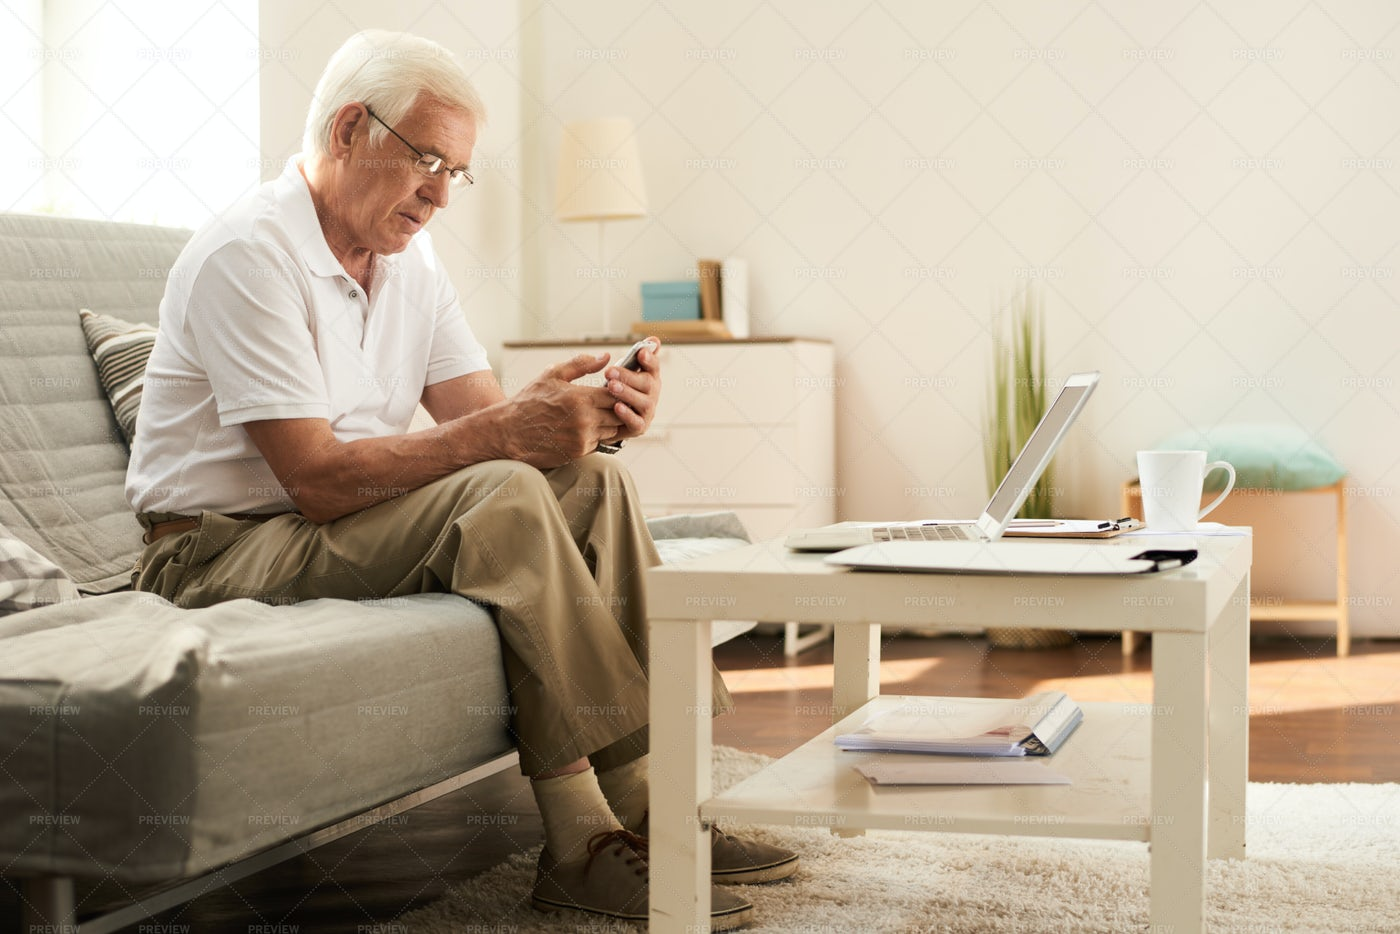 Senior Man Using Smartphone At Home: Stock Photos